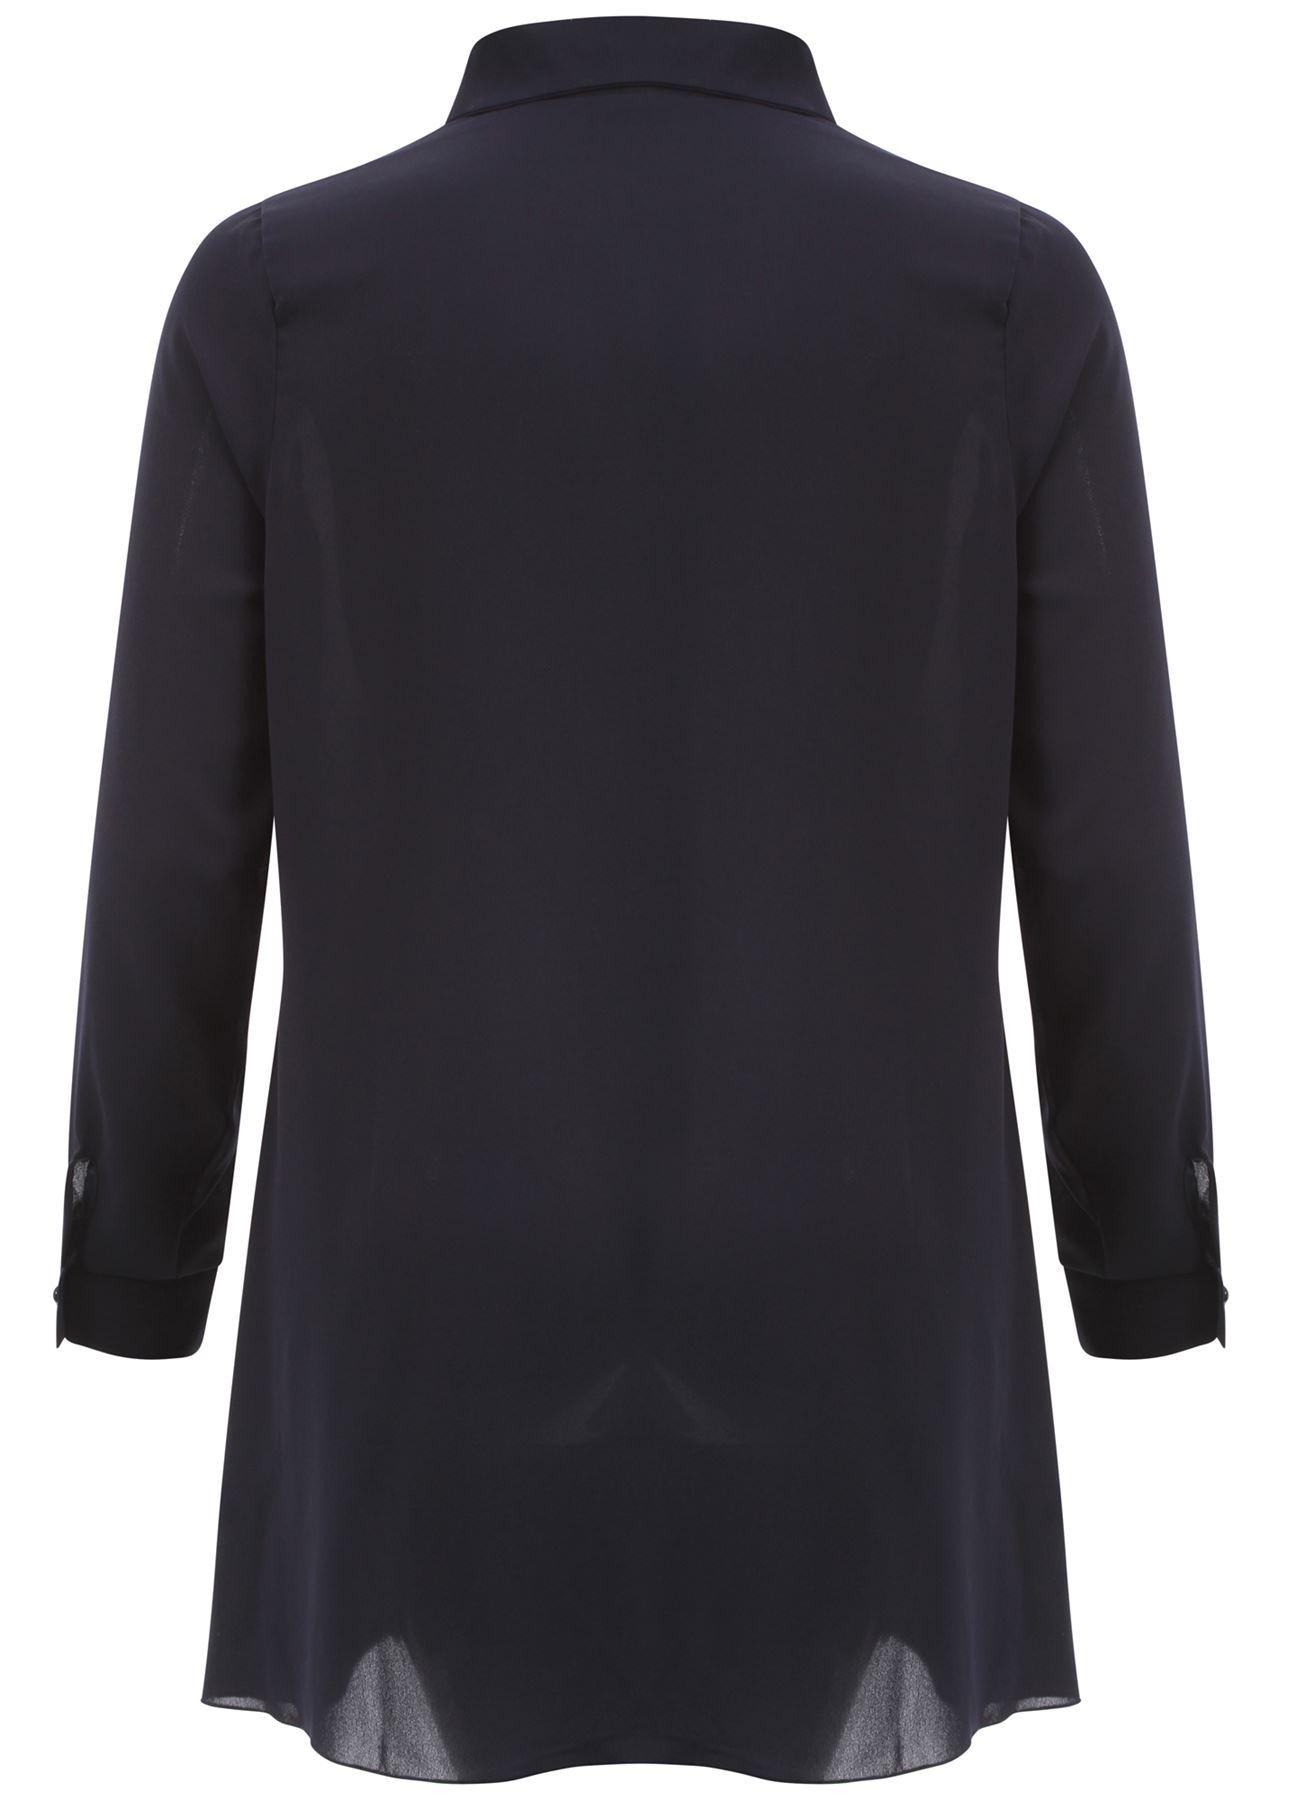 New Womens Long Tunic Plus size Chiffon Embellished Collar Shirt Tops 18-24